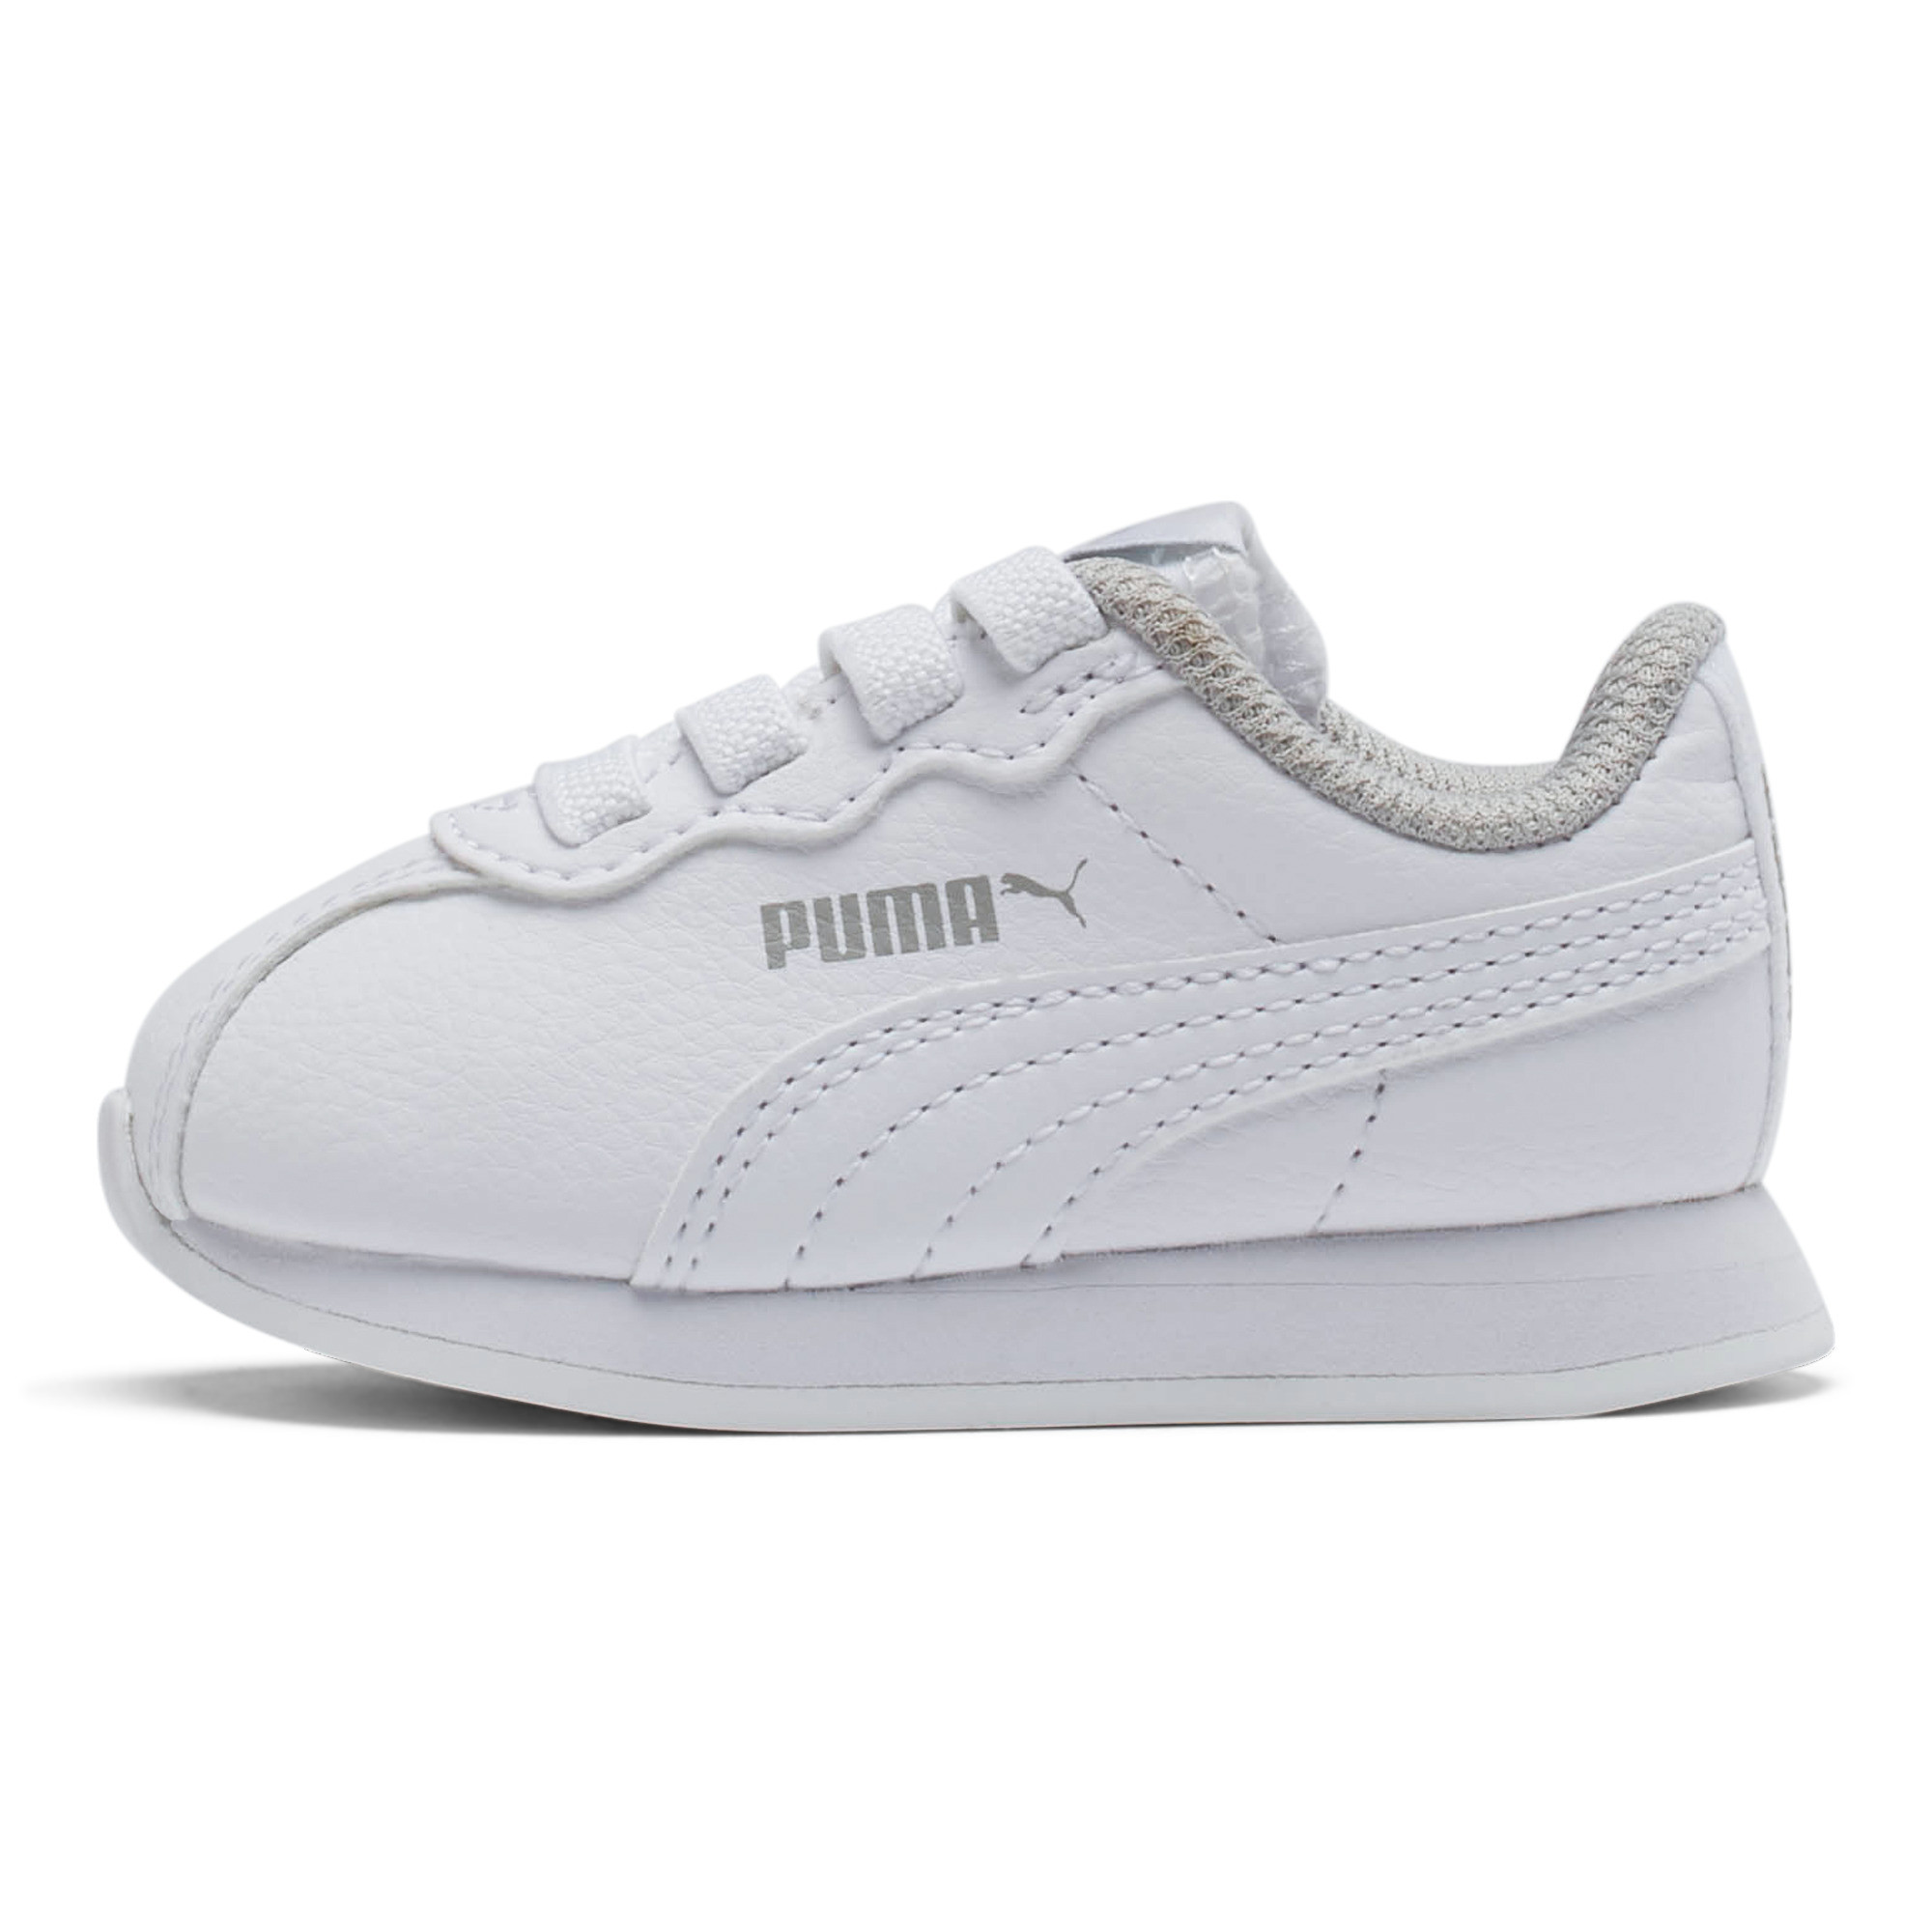 PUMA-Turin-II-AC-Toddler-Shoes-Unisex-Shoe-Kids thumbnail 4